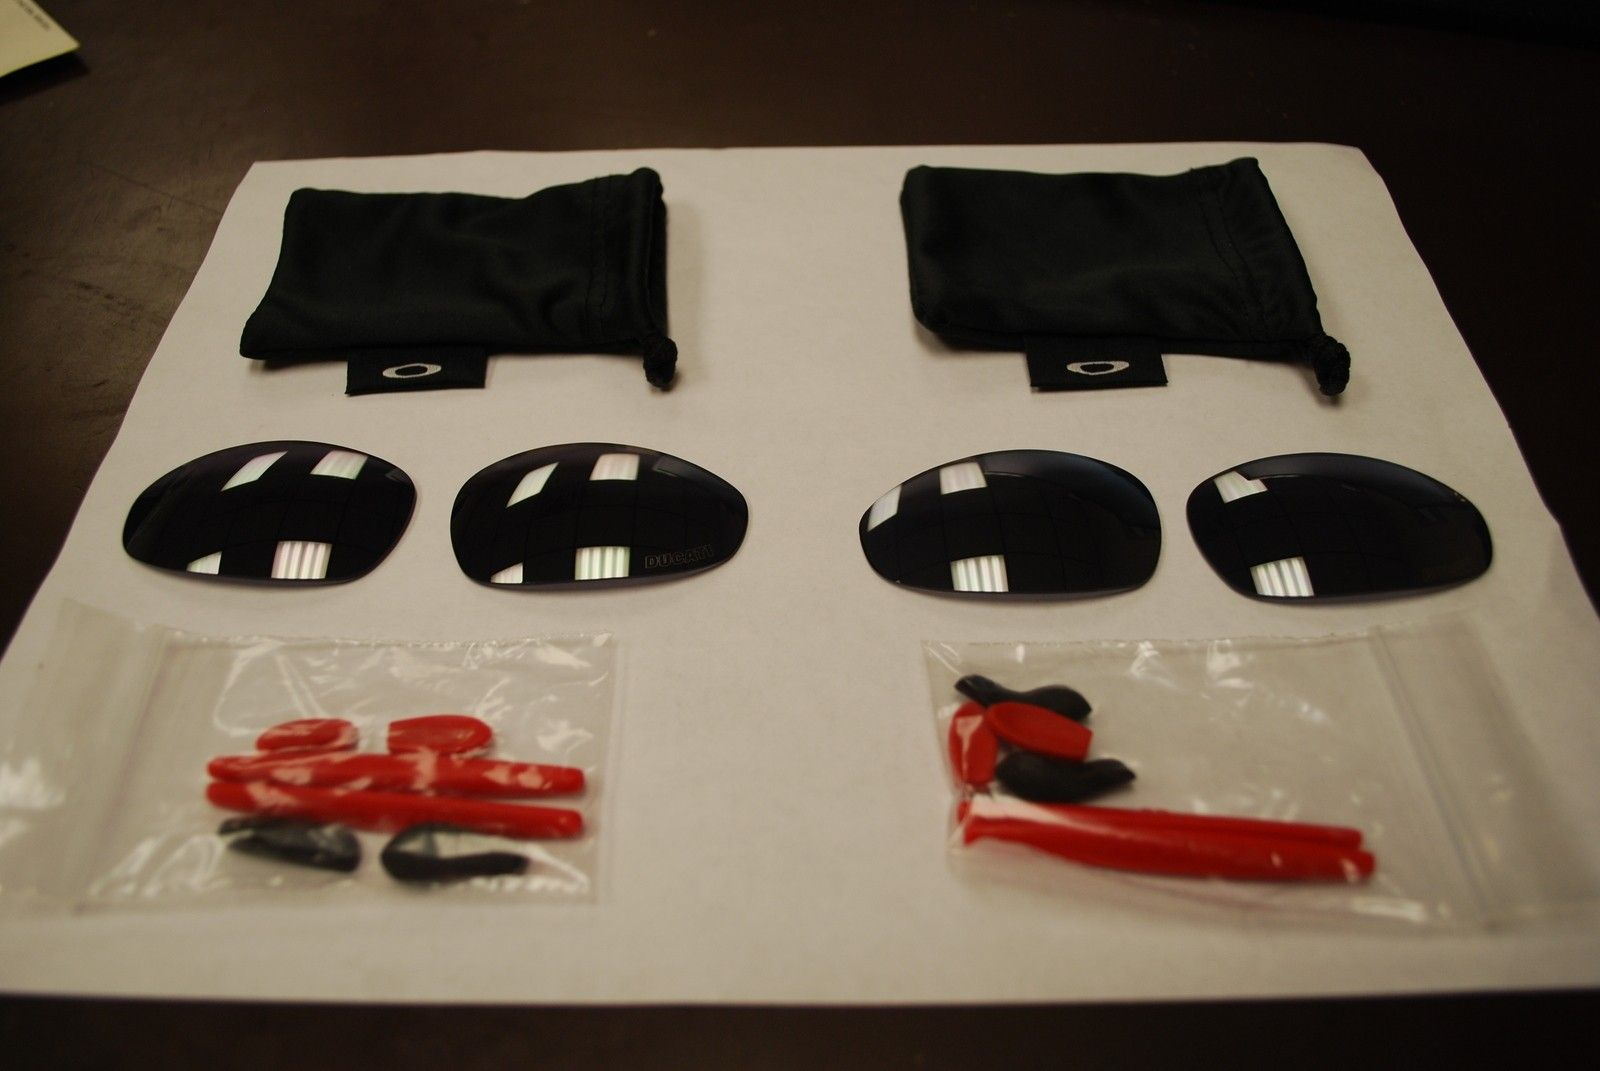 Lenses and rubbers, Ducati, Penny VR28 & more - DSC_0709.JPG